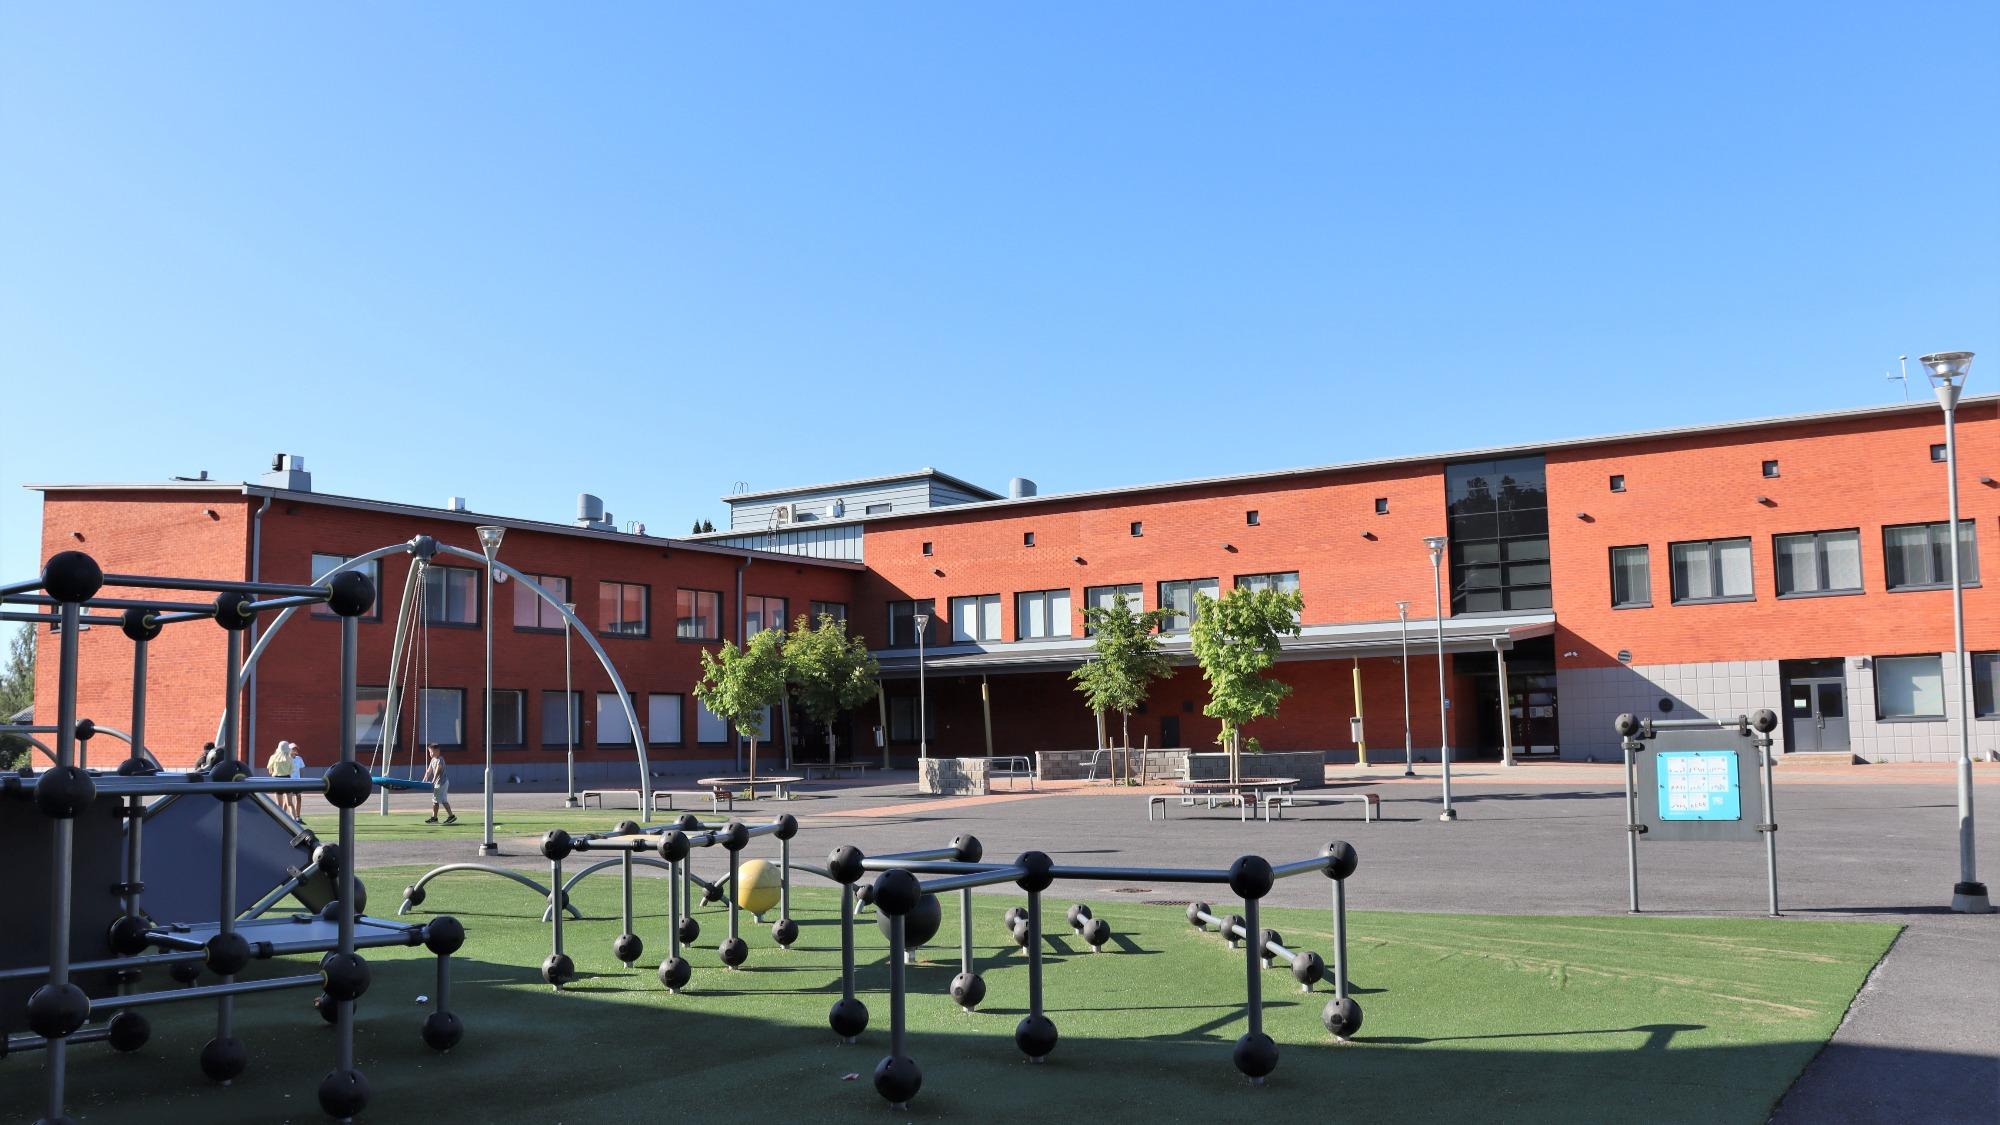 Lucina Hagmanin koulu pihalta katsottuna.